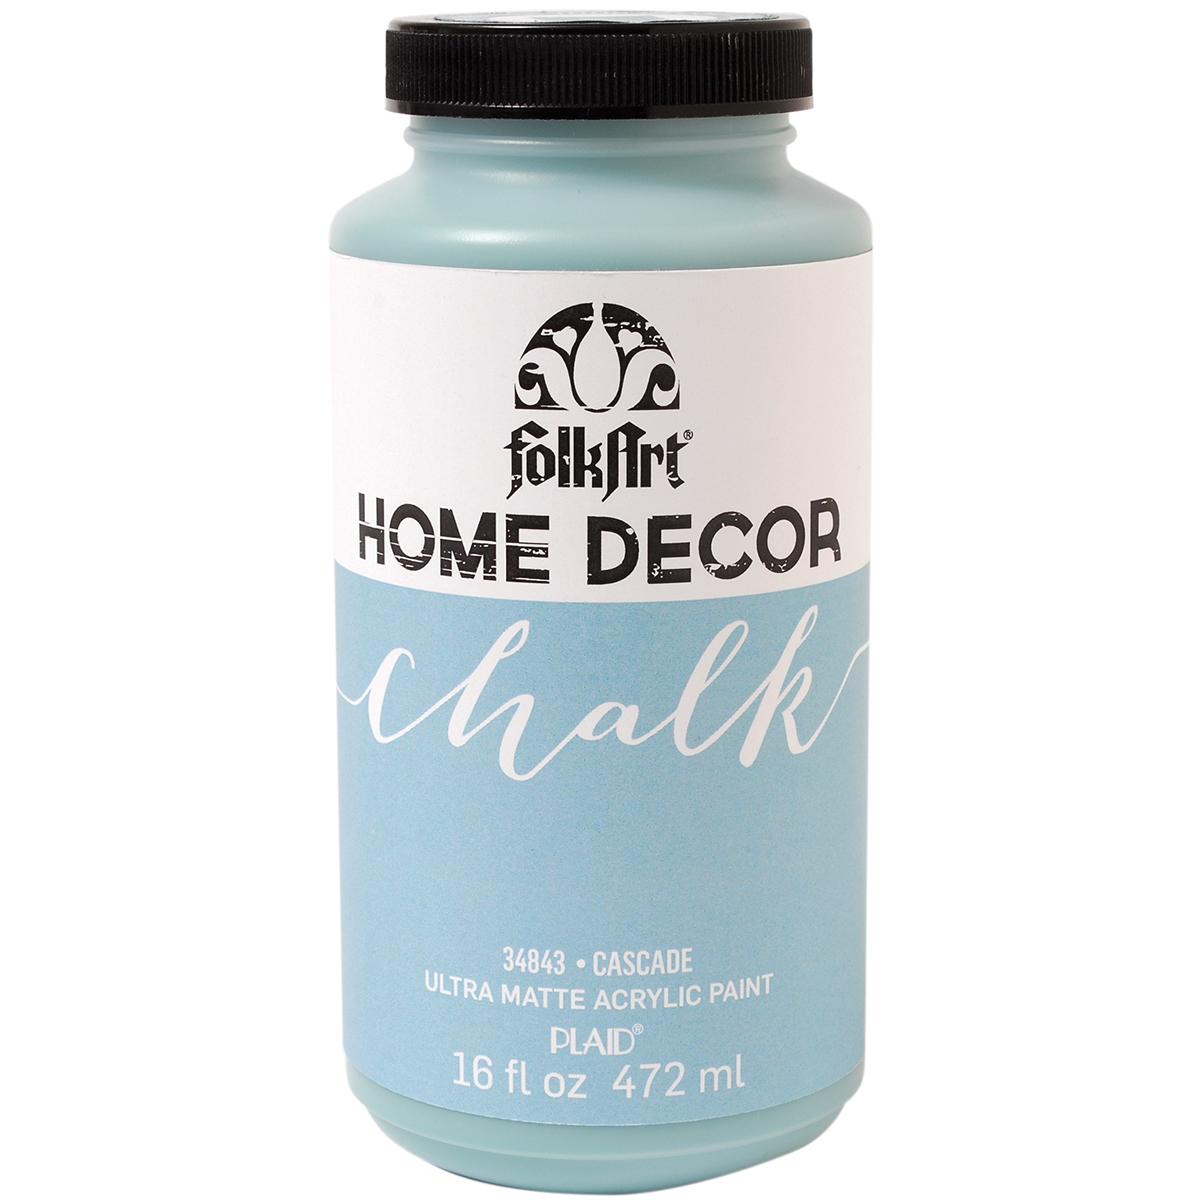 Folkart Home Decor Chalk Paint 16oz-Cascade